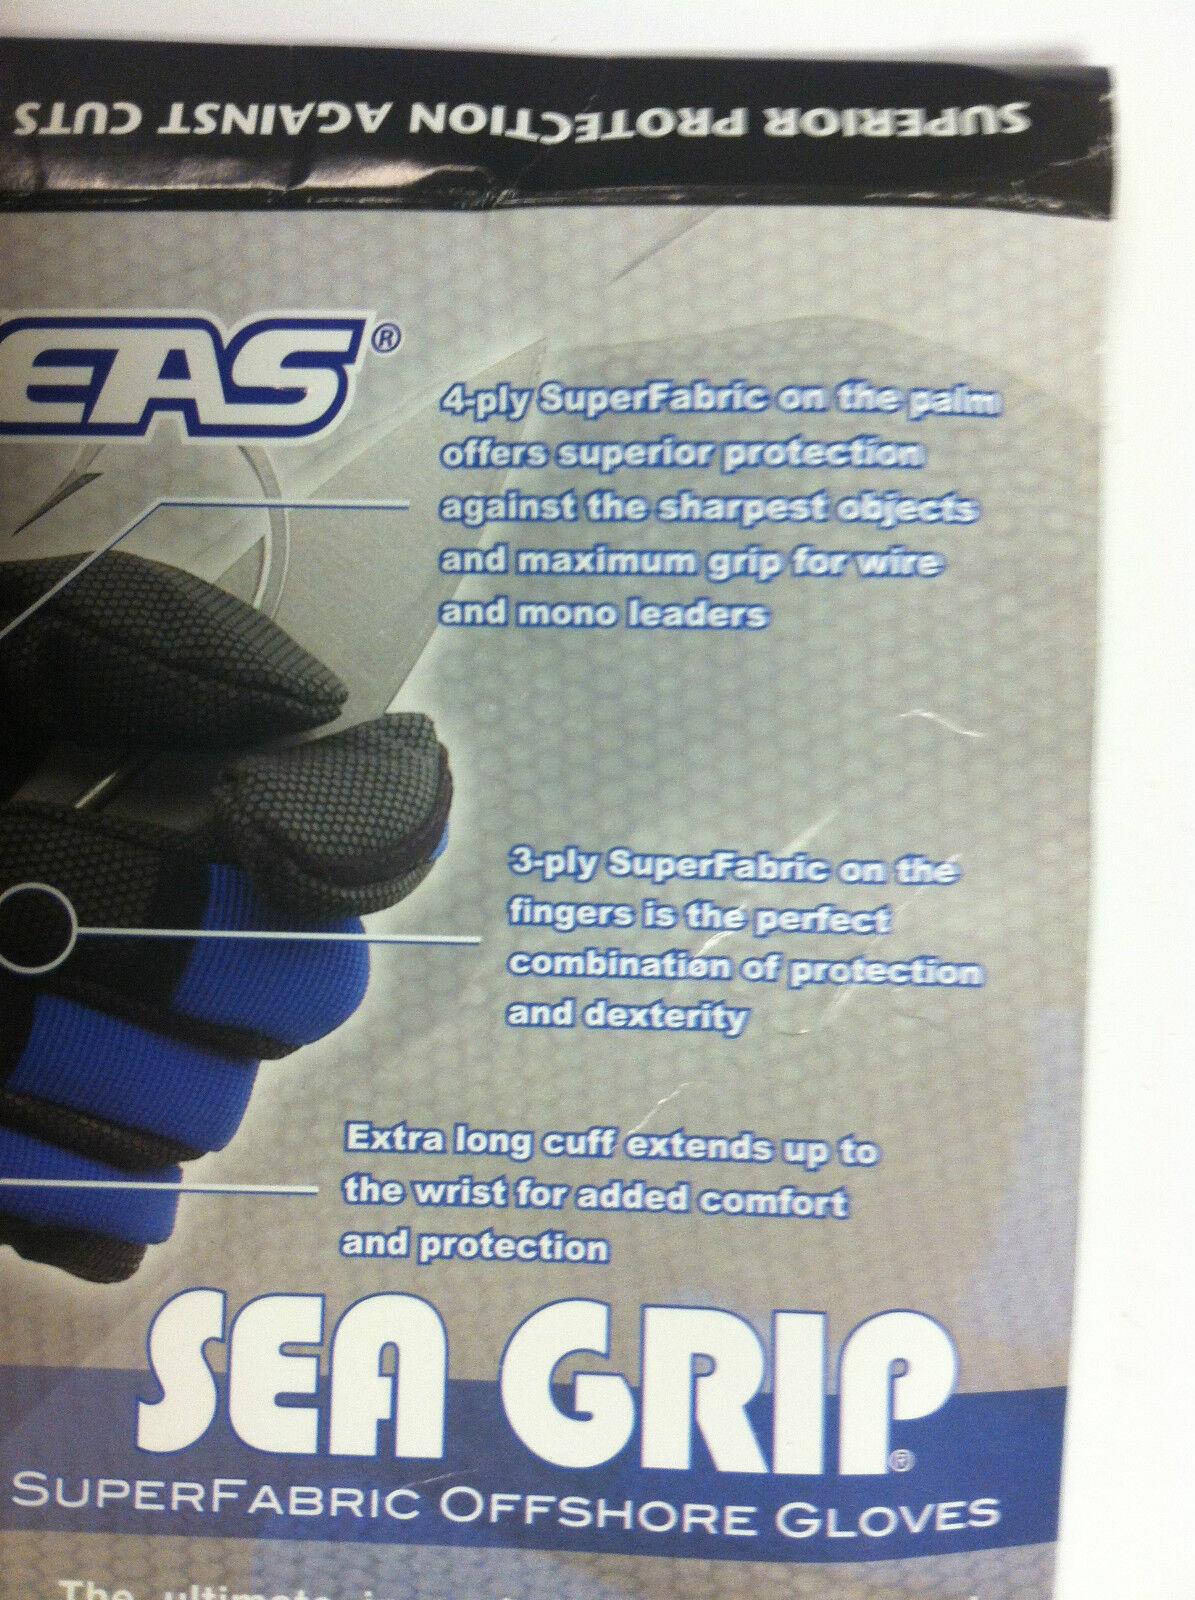 AFW SEA GRIP SUPER FABRIC OFFSHORE GLOVES - Blau Blau Blau - ULTIMATE PROTECTION edbb0f